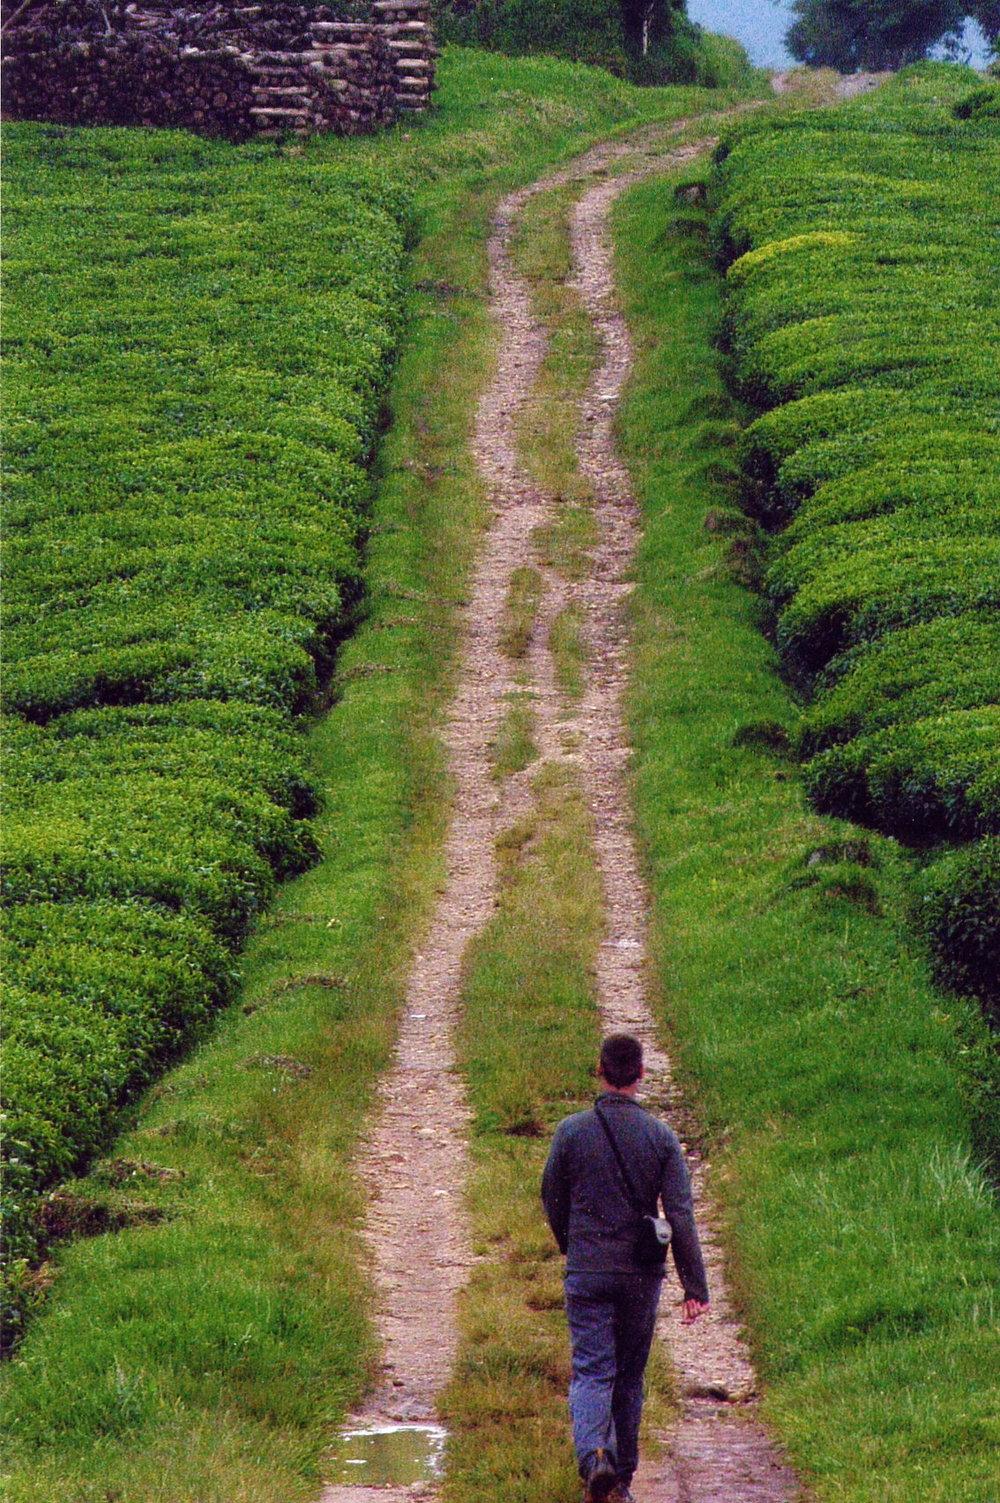 Ben, Rwanda tea fields, ascending on his journey.